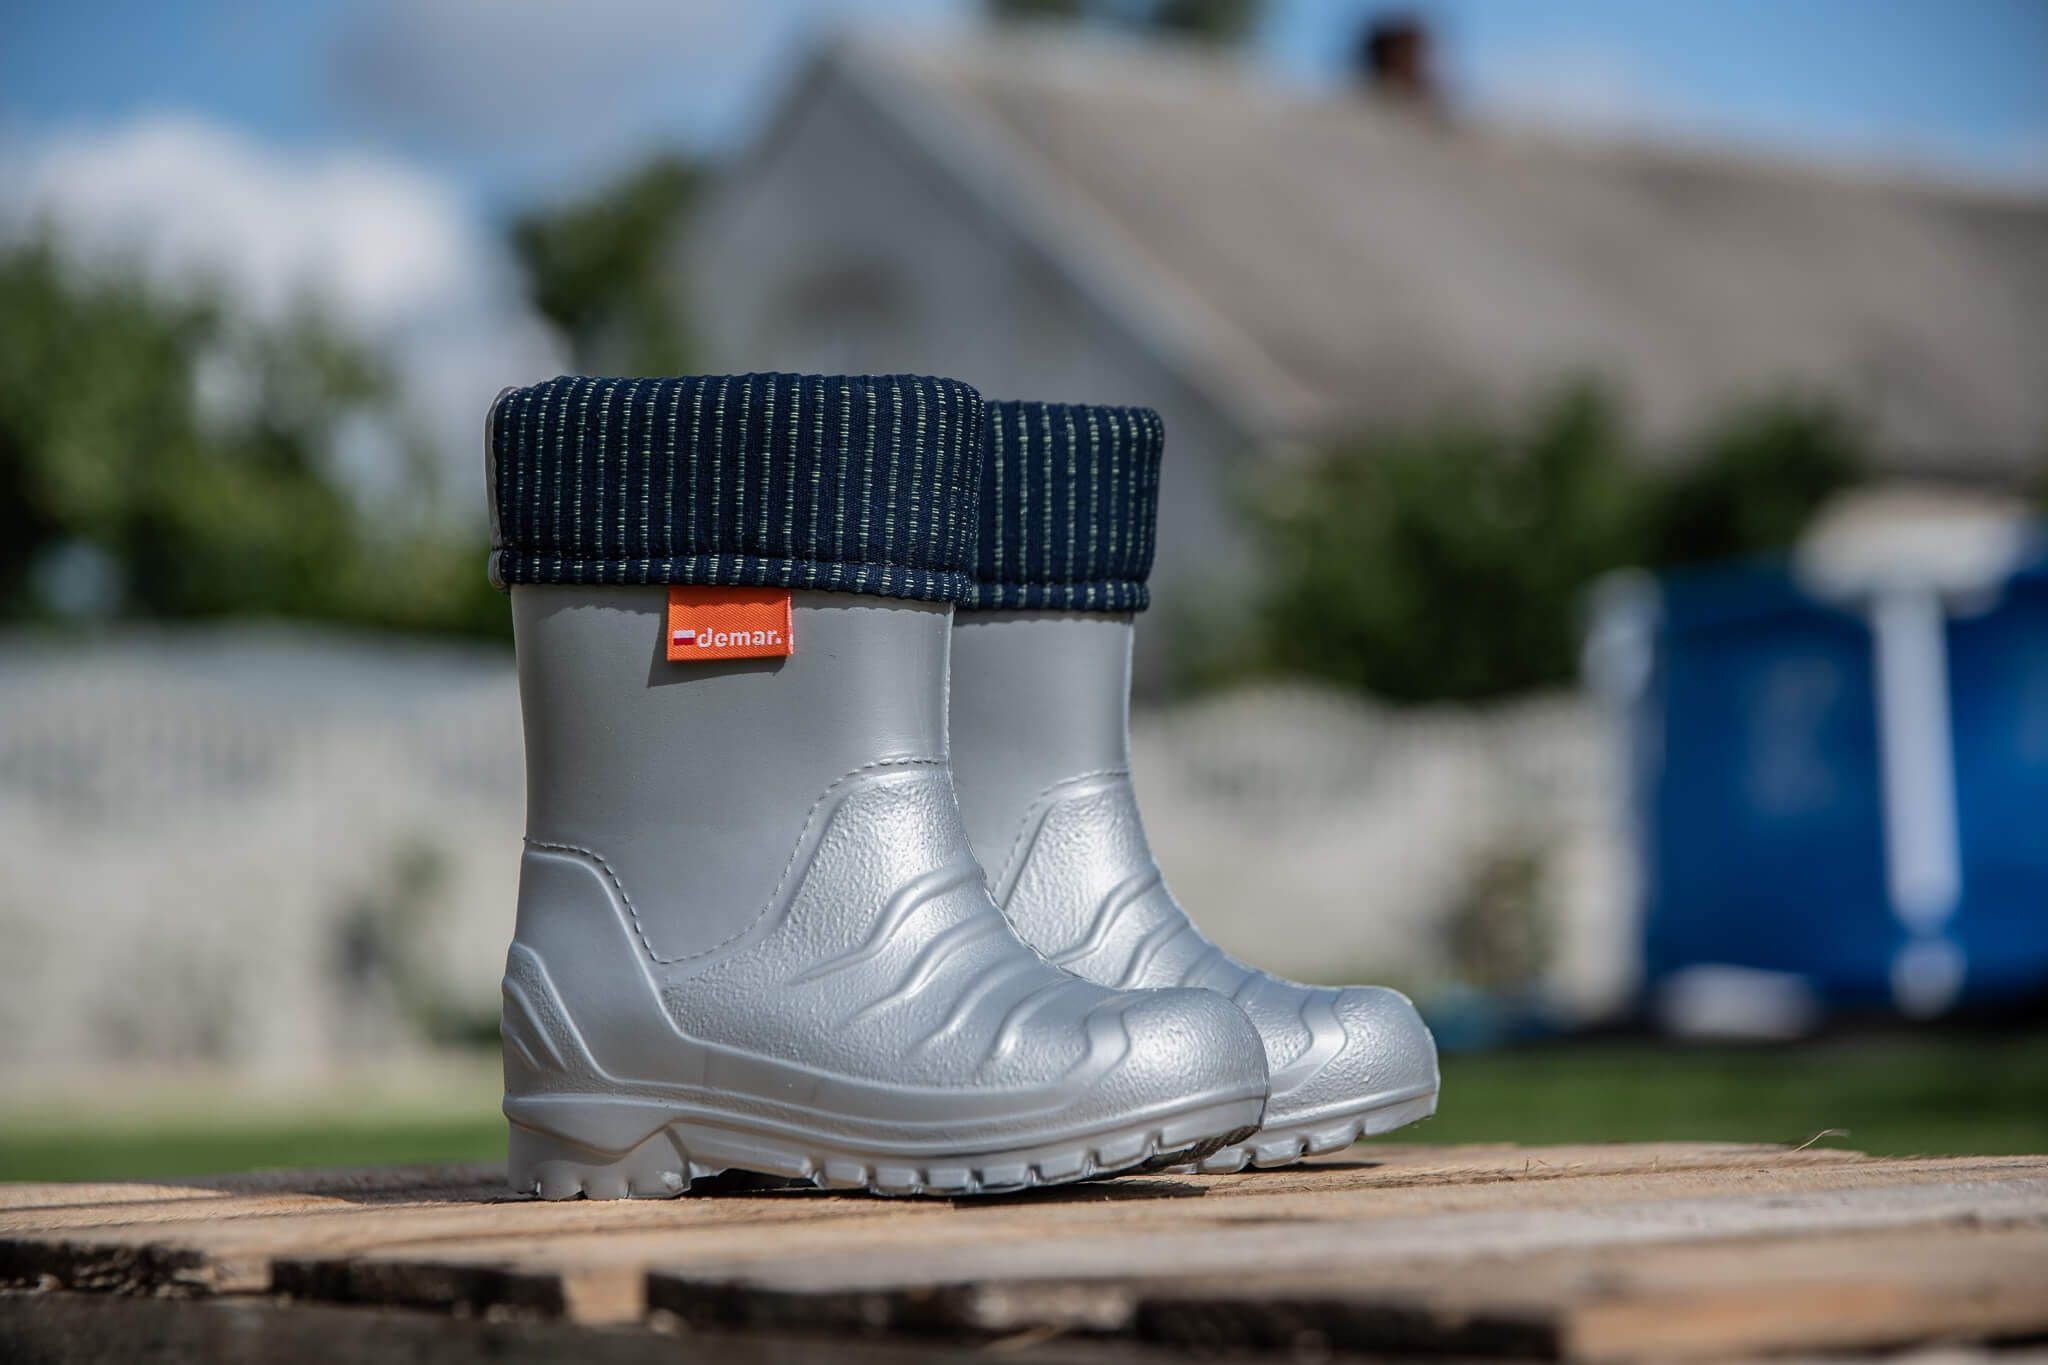 Kalosze Piankowe Dla Dzieci Szare Lekkie Pianka Demar Dino H Kids Wellies Small Shoes Uk Summer